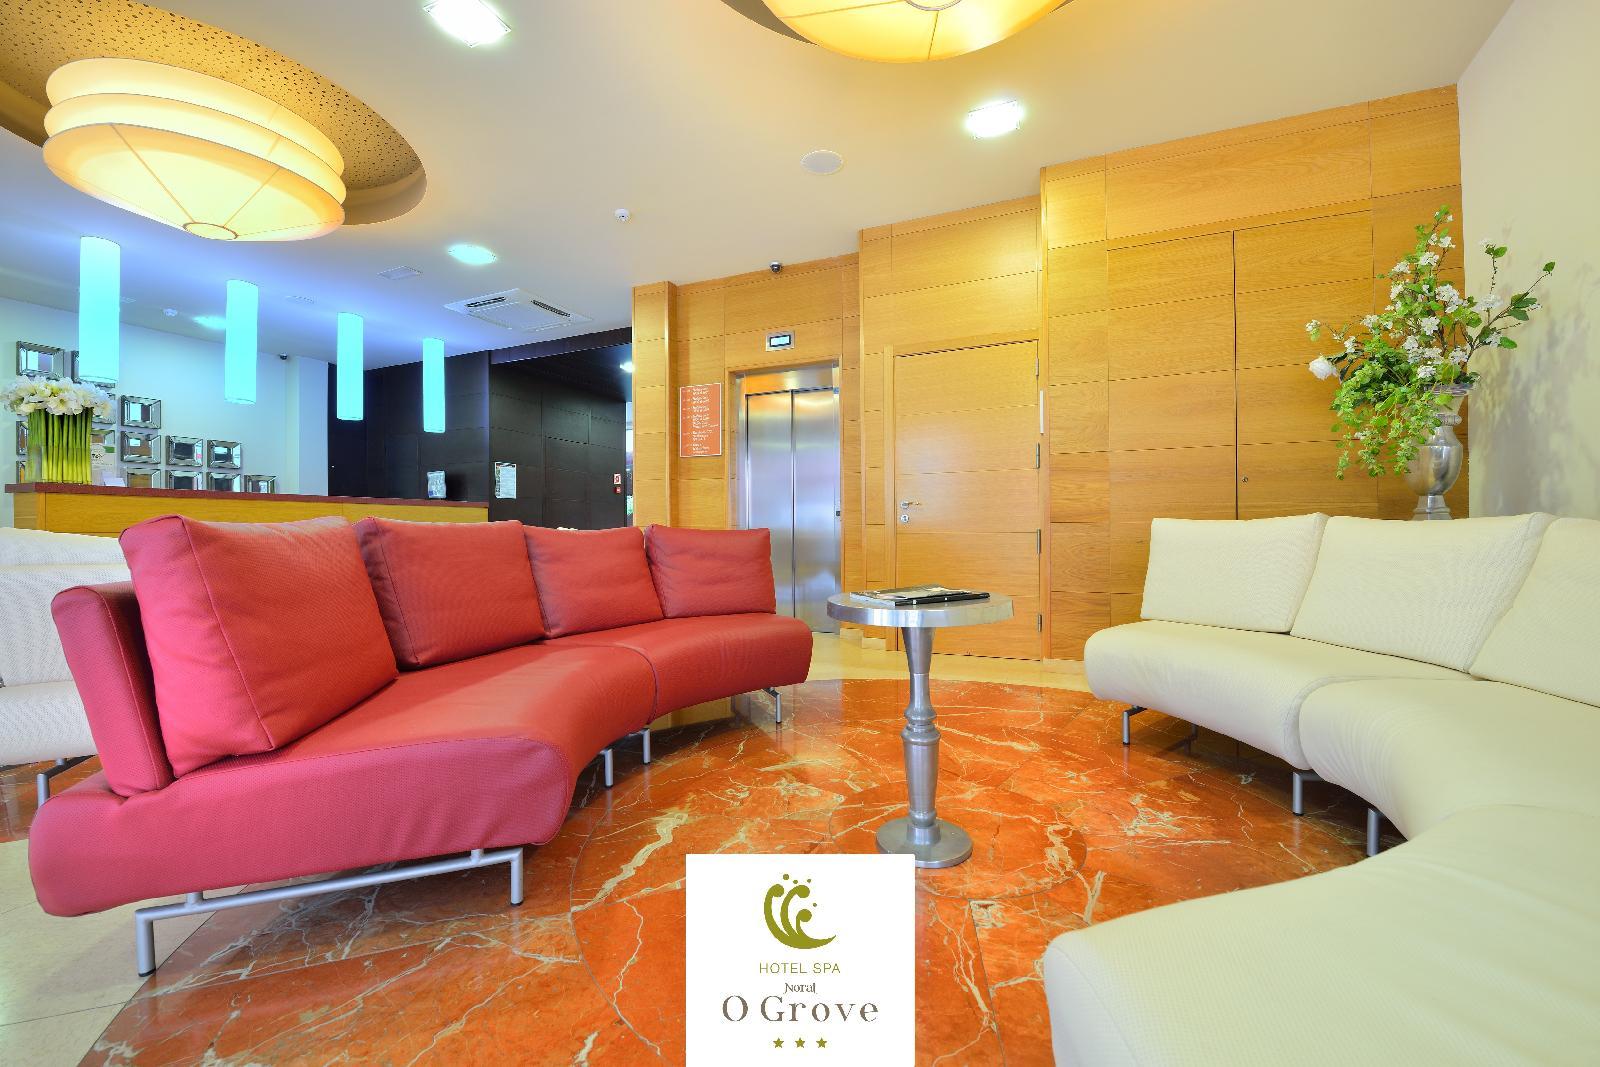 2. Hotel Spa Norat O Grove